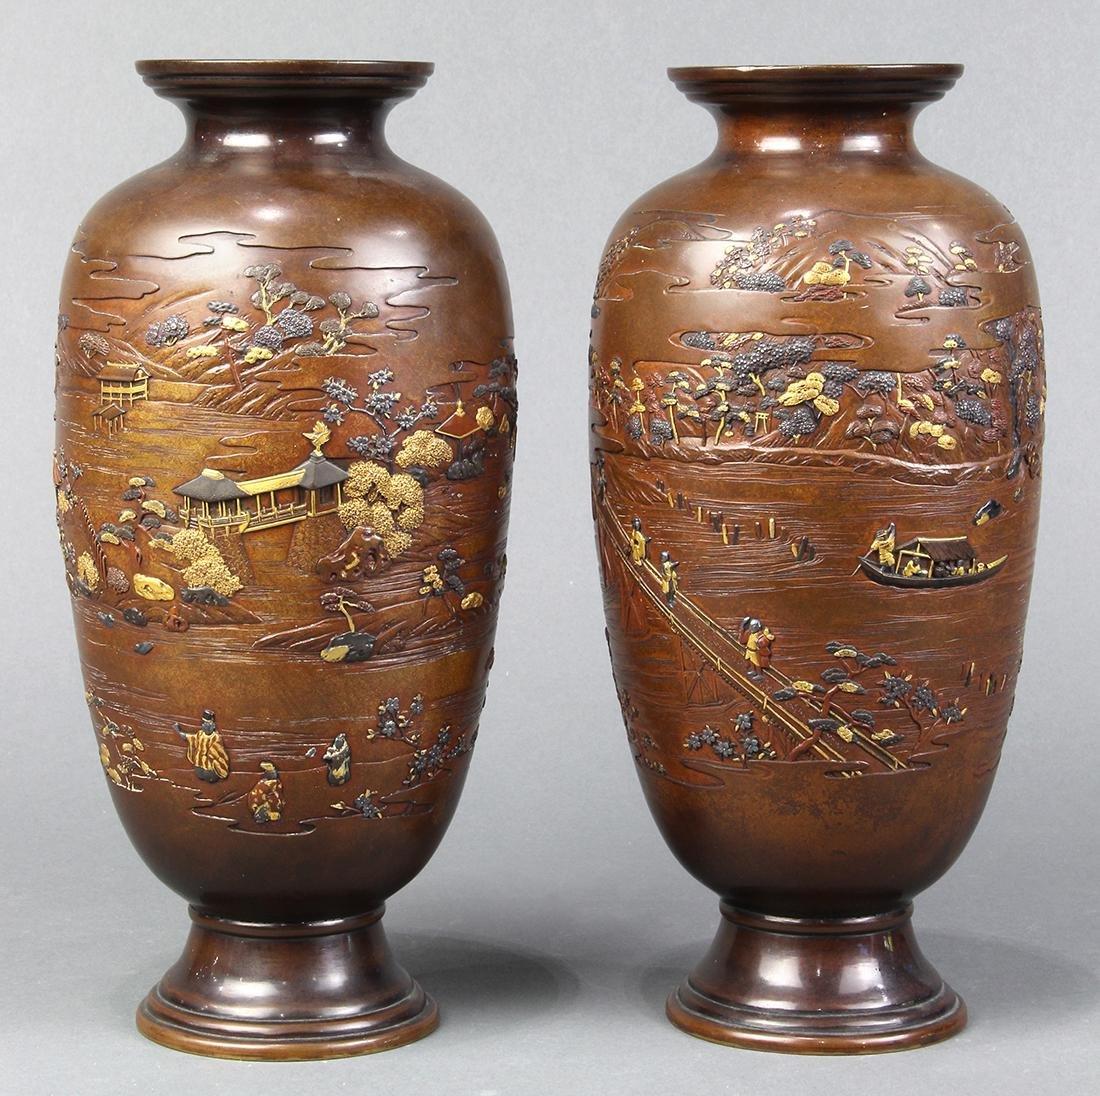 Japanese Pair of Bronze Vases, Meiji